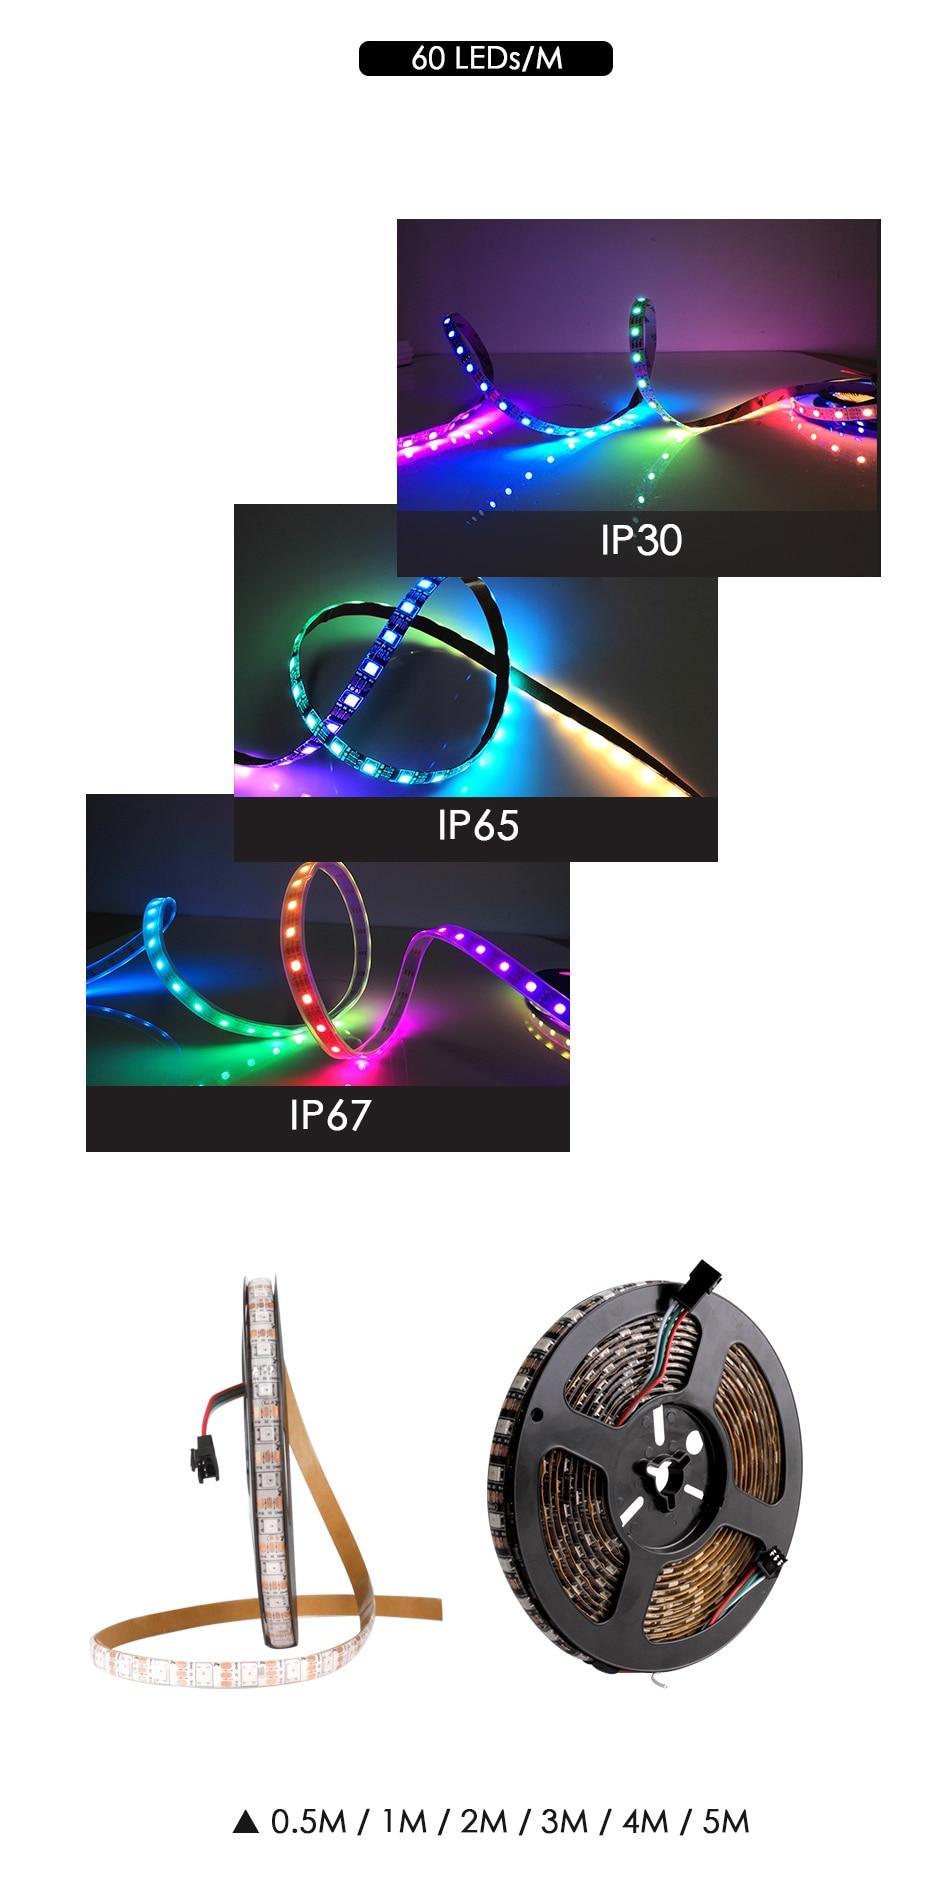 WS2812B DC 5V LED Strip RGB 50CM 1M 2M 3M 4M 5M 30/60/144 LEDs Smart Addressable Pixel Black White PCB WS2812 IC 17Key Bar